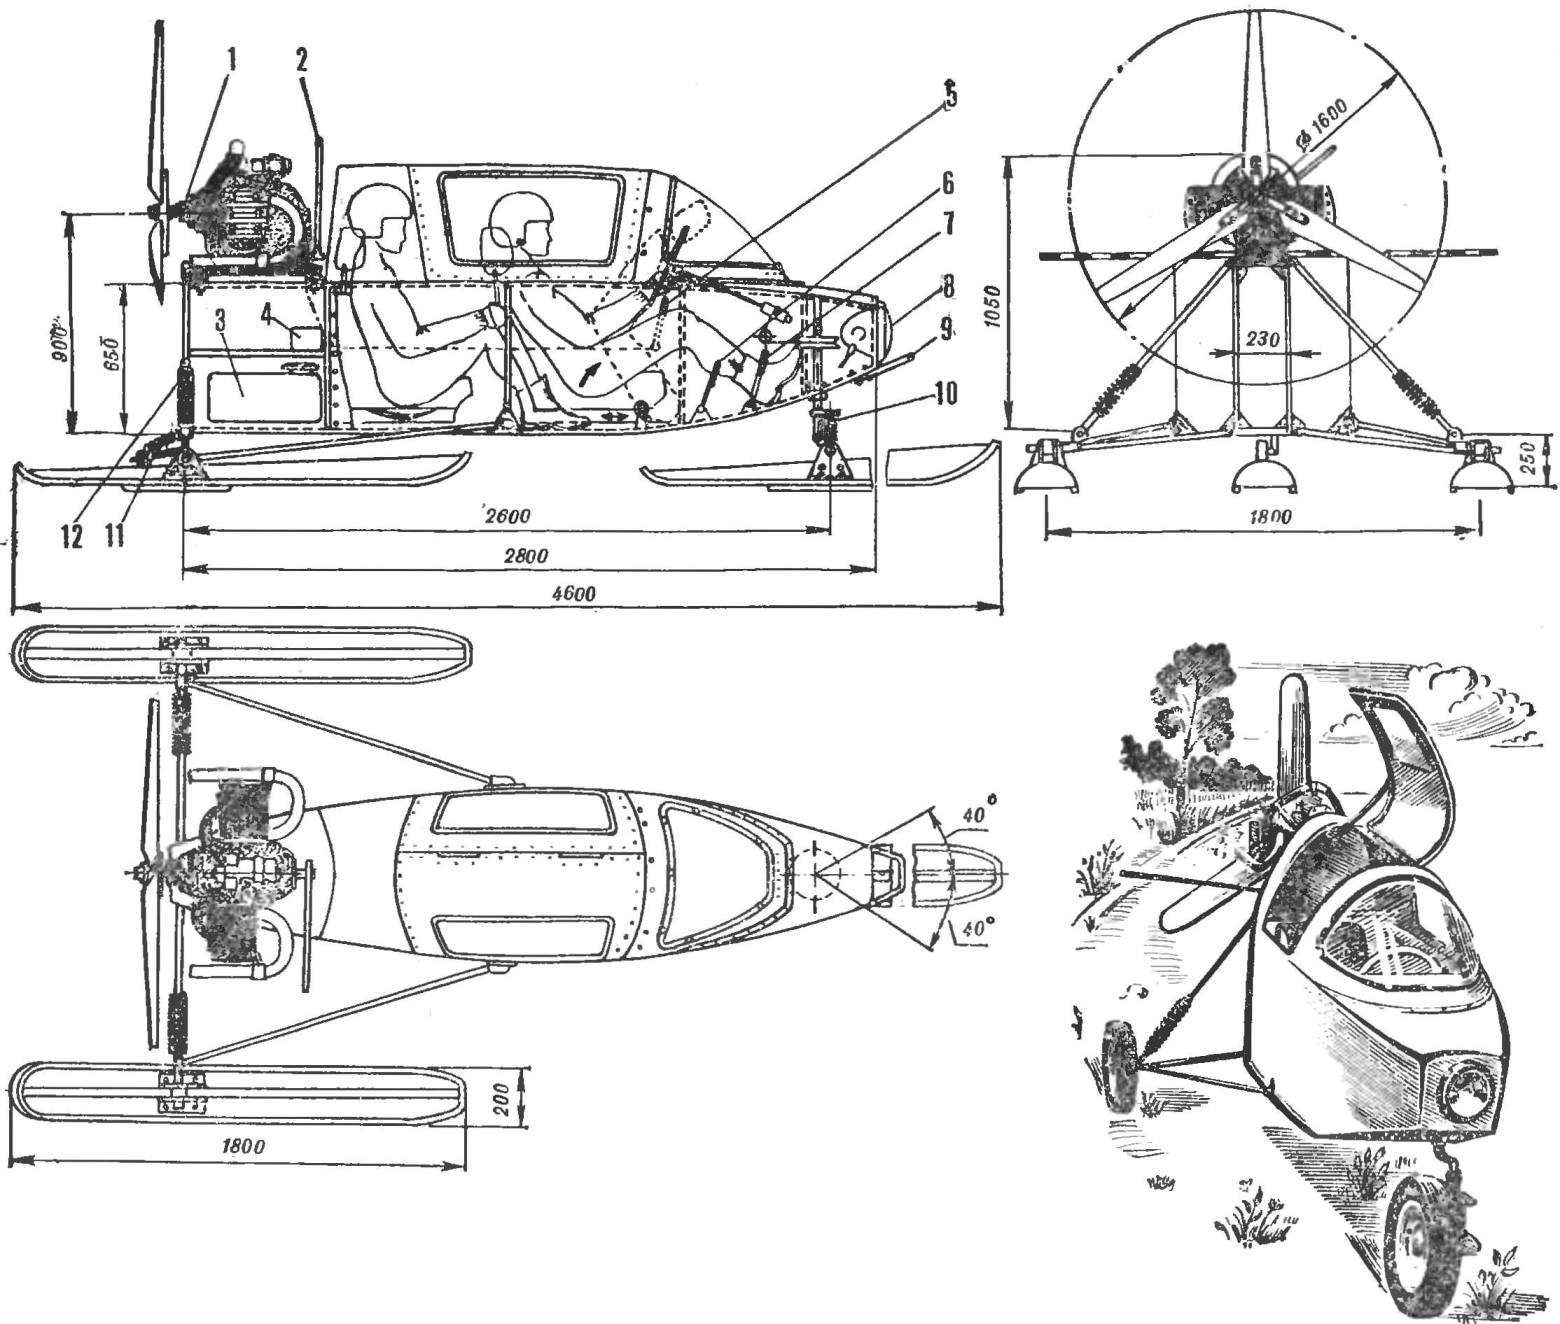 Рис. 3. Аэросани ПМ-4